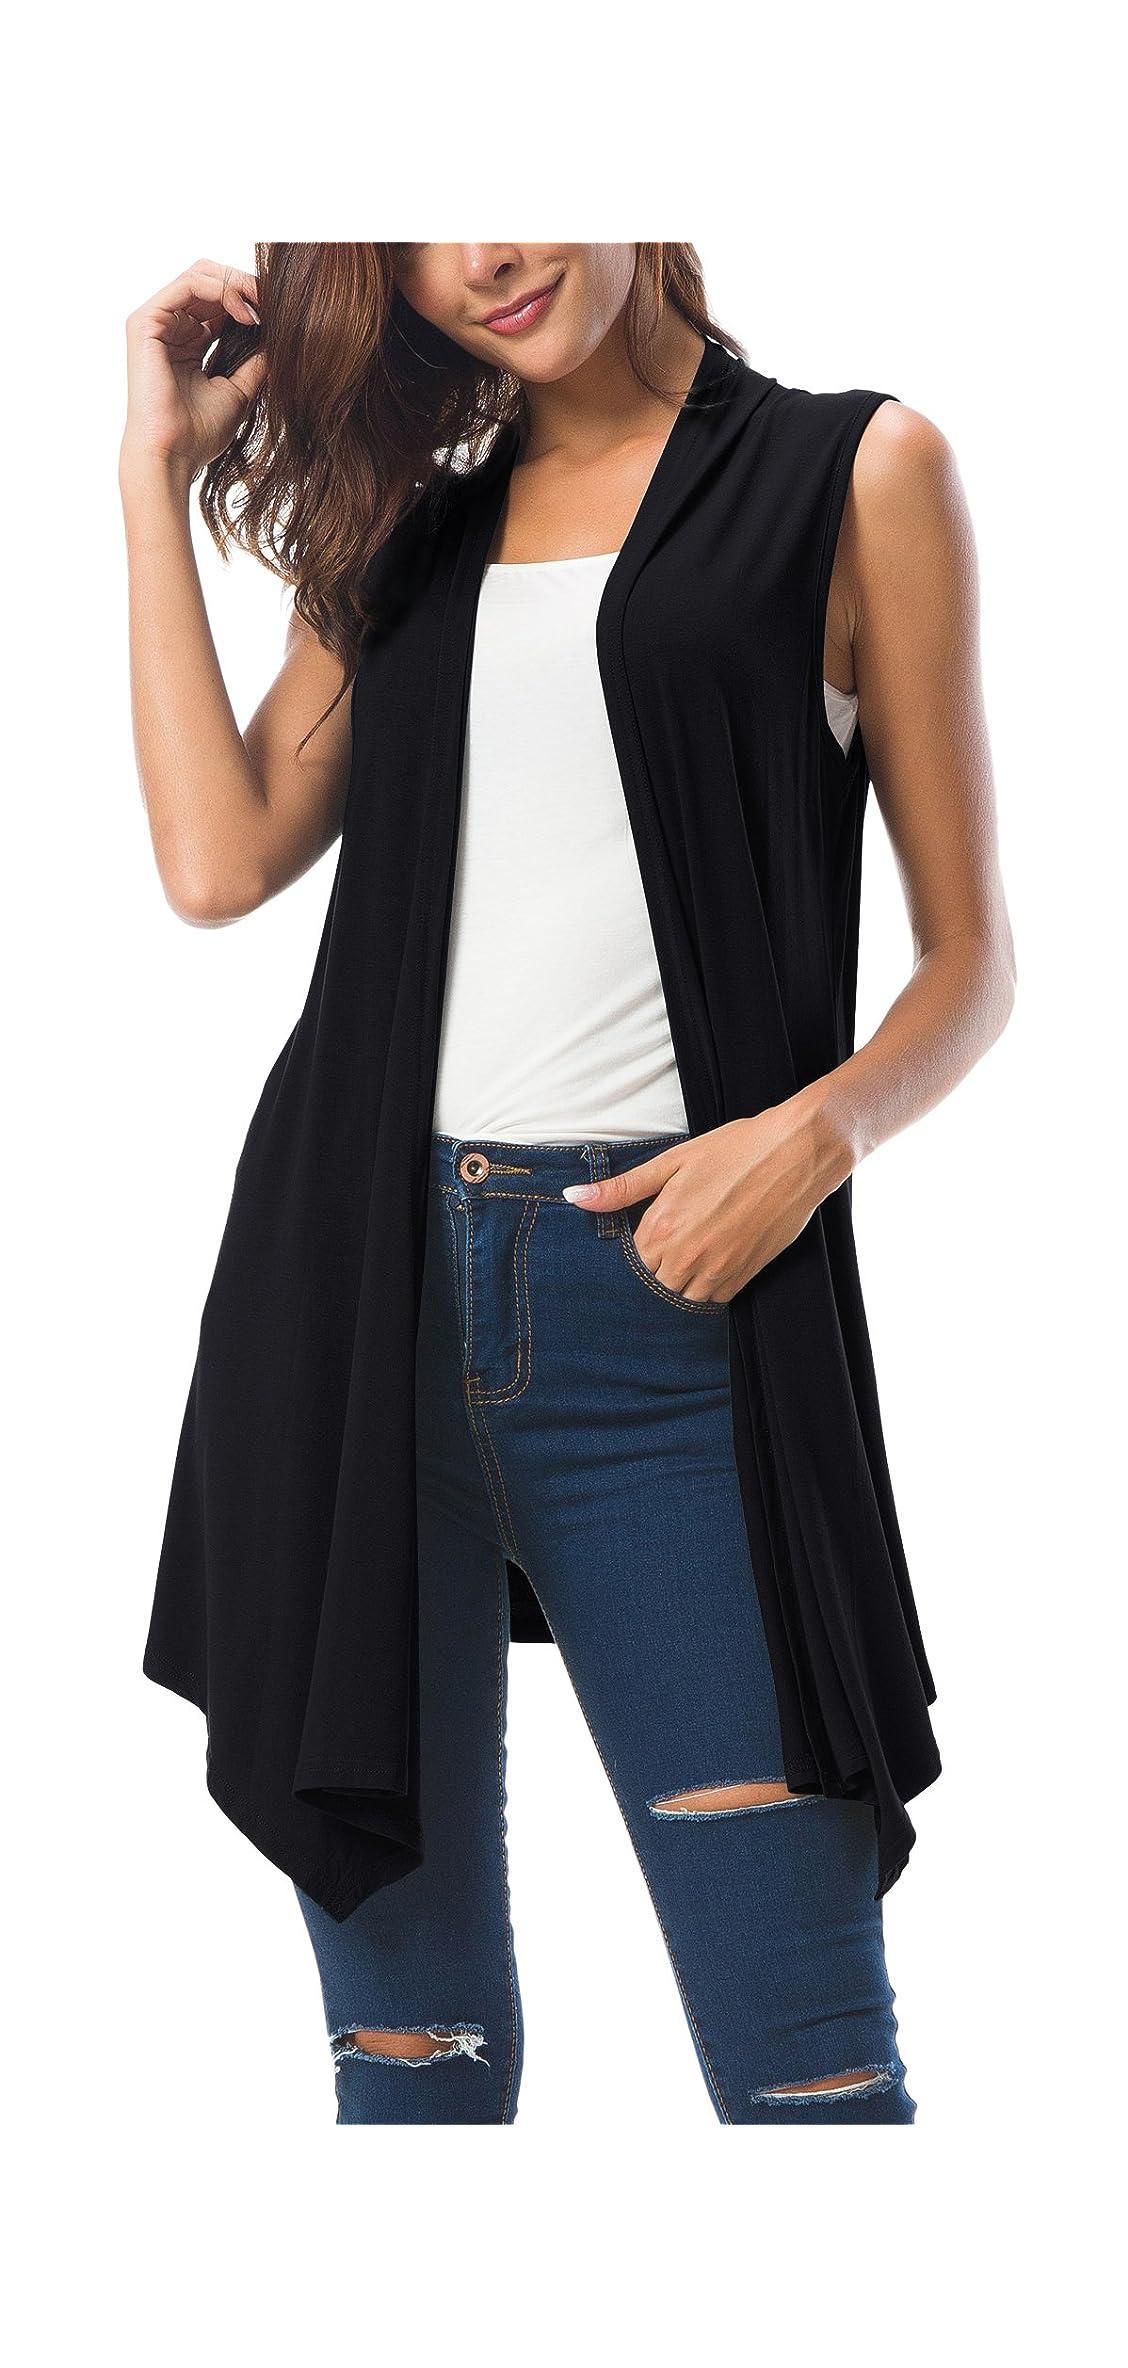 Women's Sleeveless Draped Open Front Cardigan Vest Asymmetric